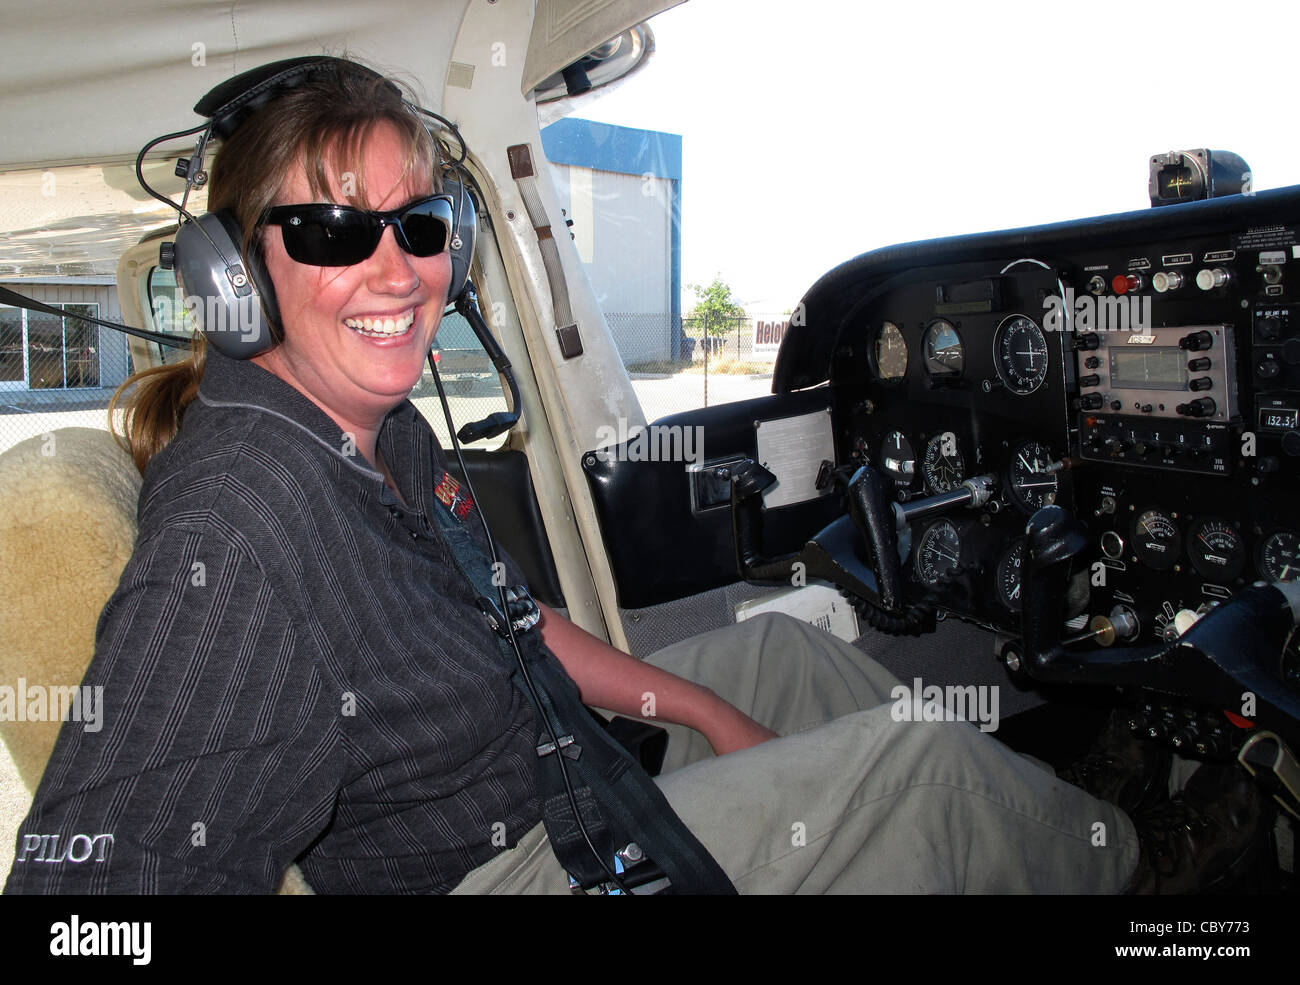 female pilot in cockpit of Cessna 172 - Stock Image